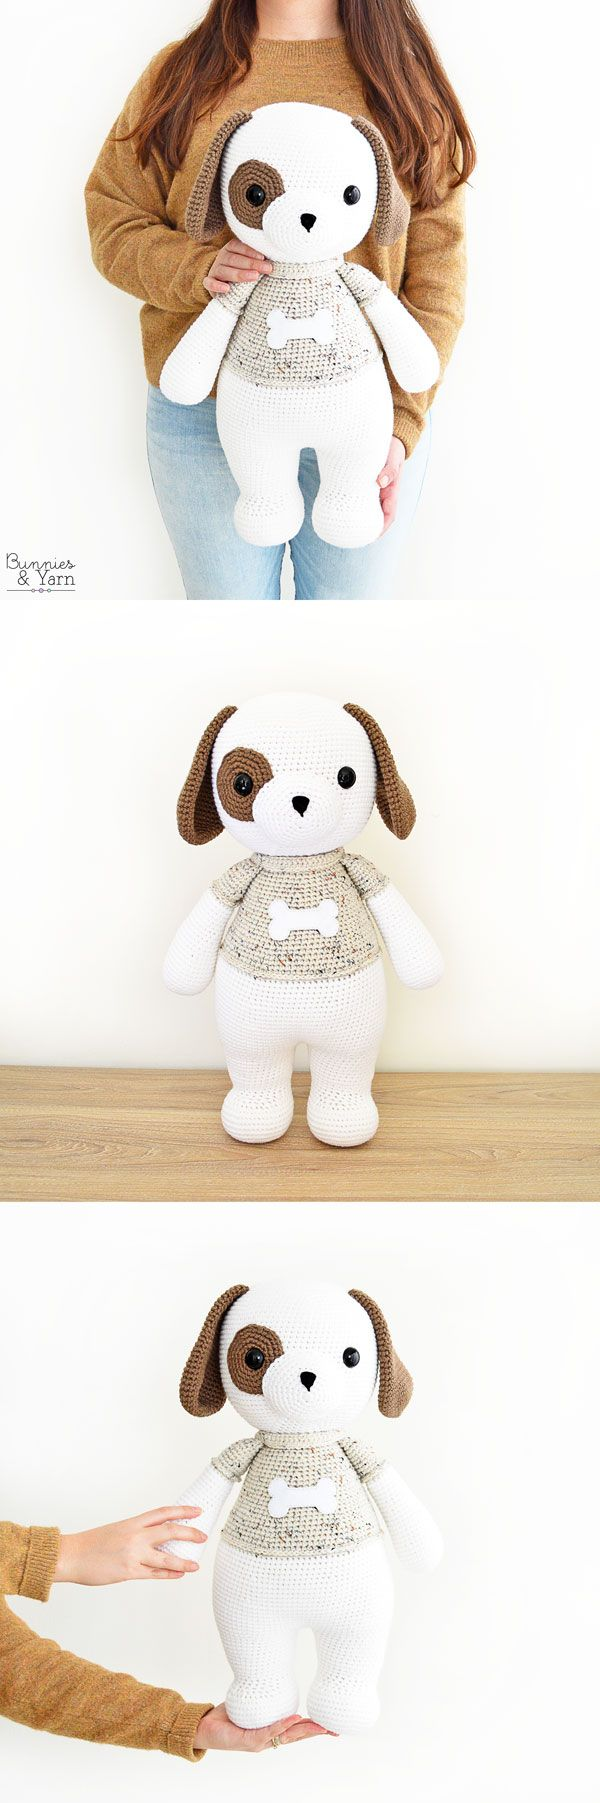 Crochet Pattern - Thomas the Friendly Dog - Amigurumi